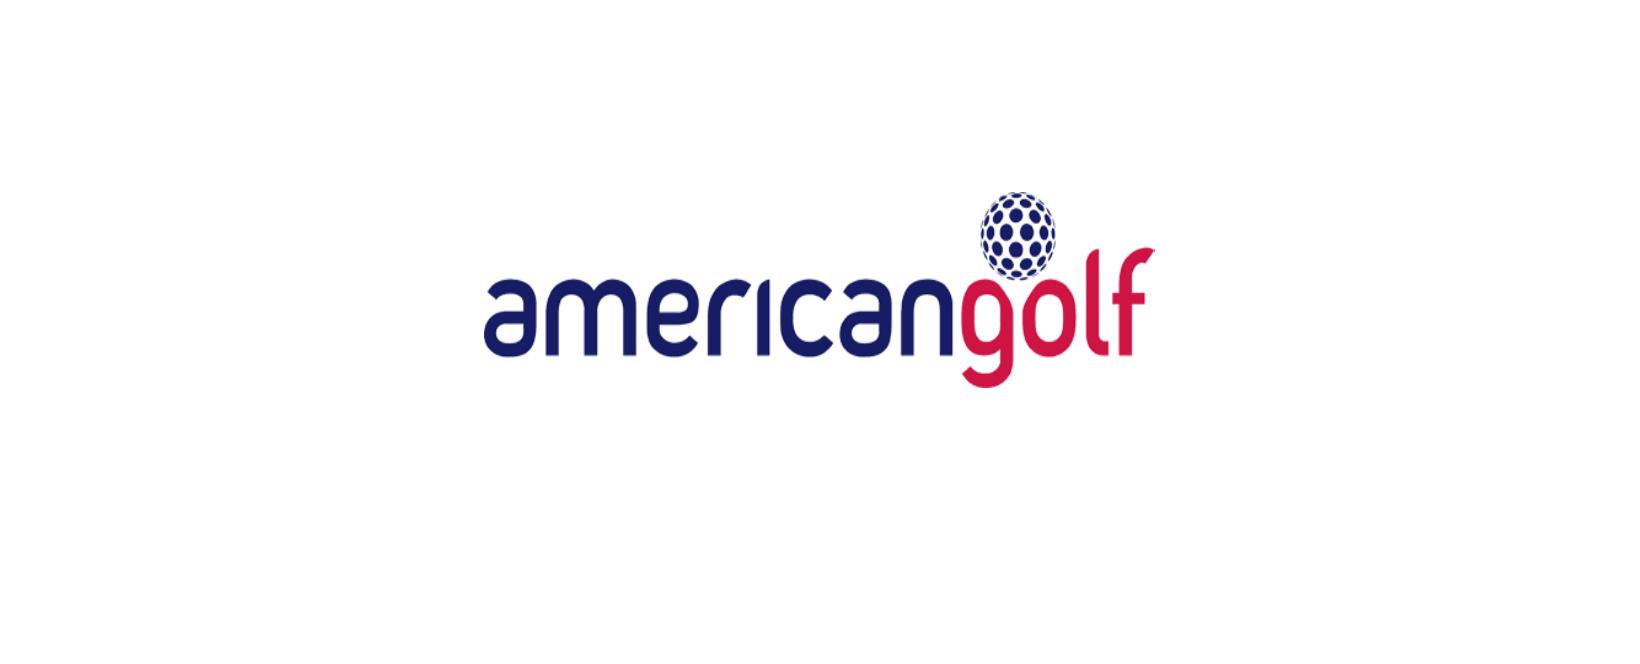 American Golf Discount Code 2021